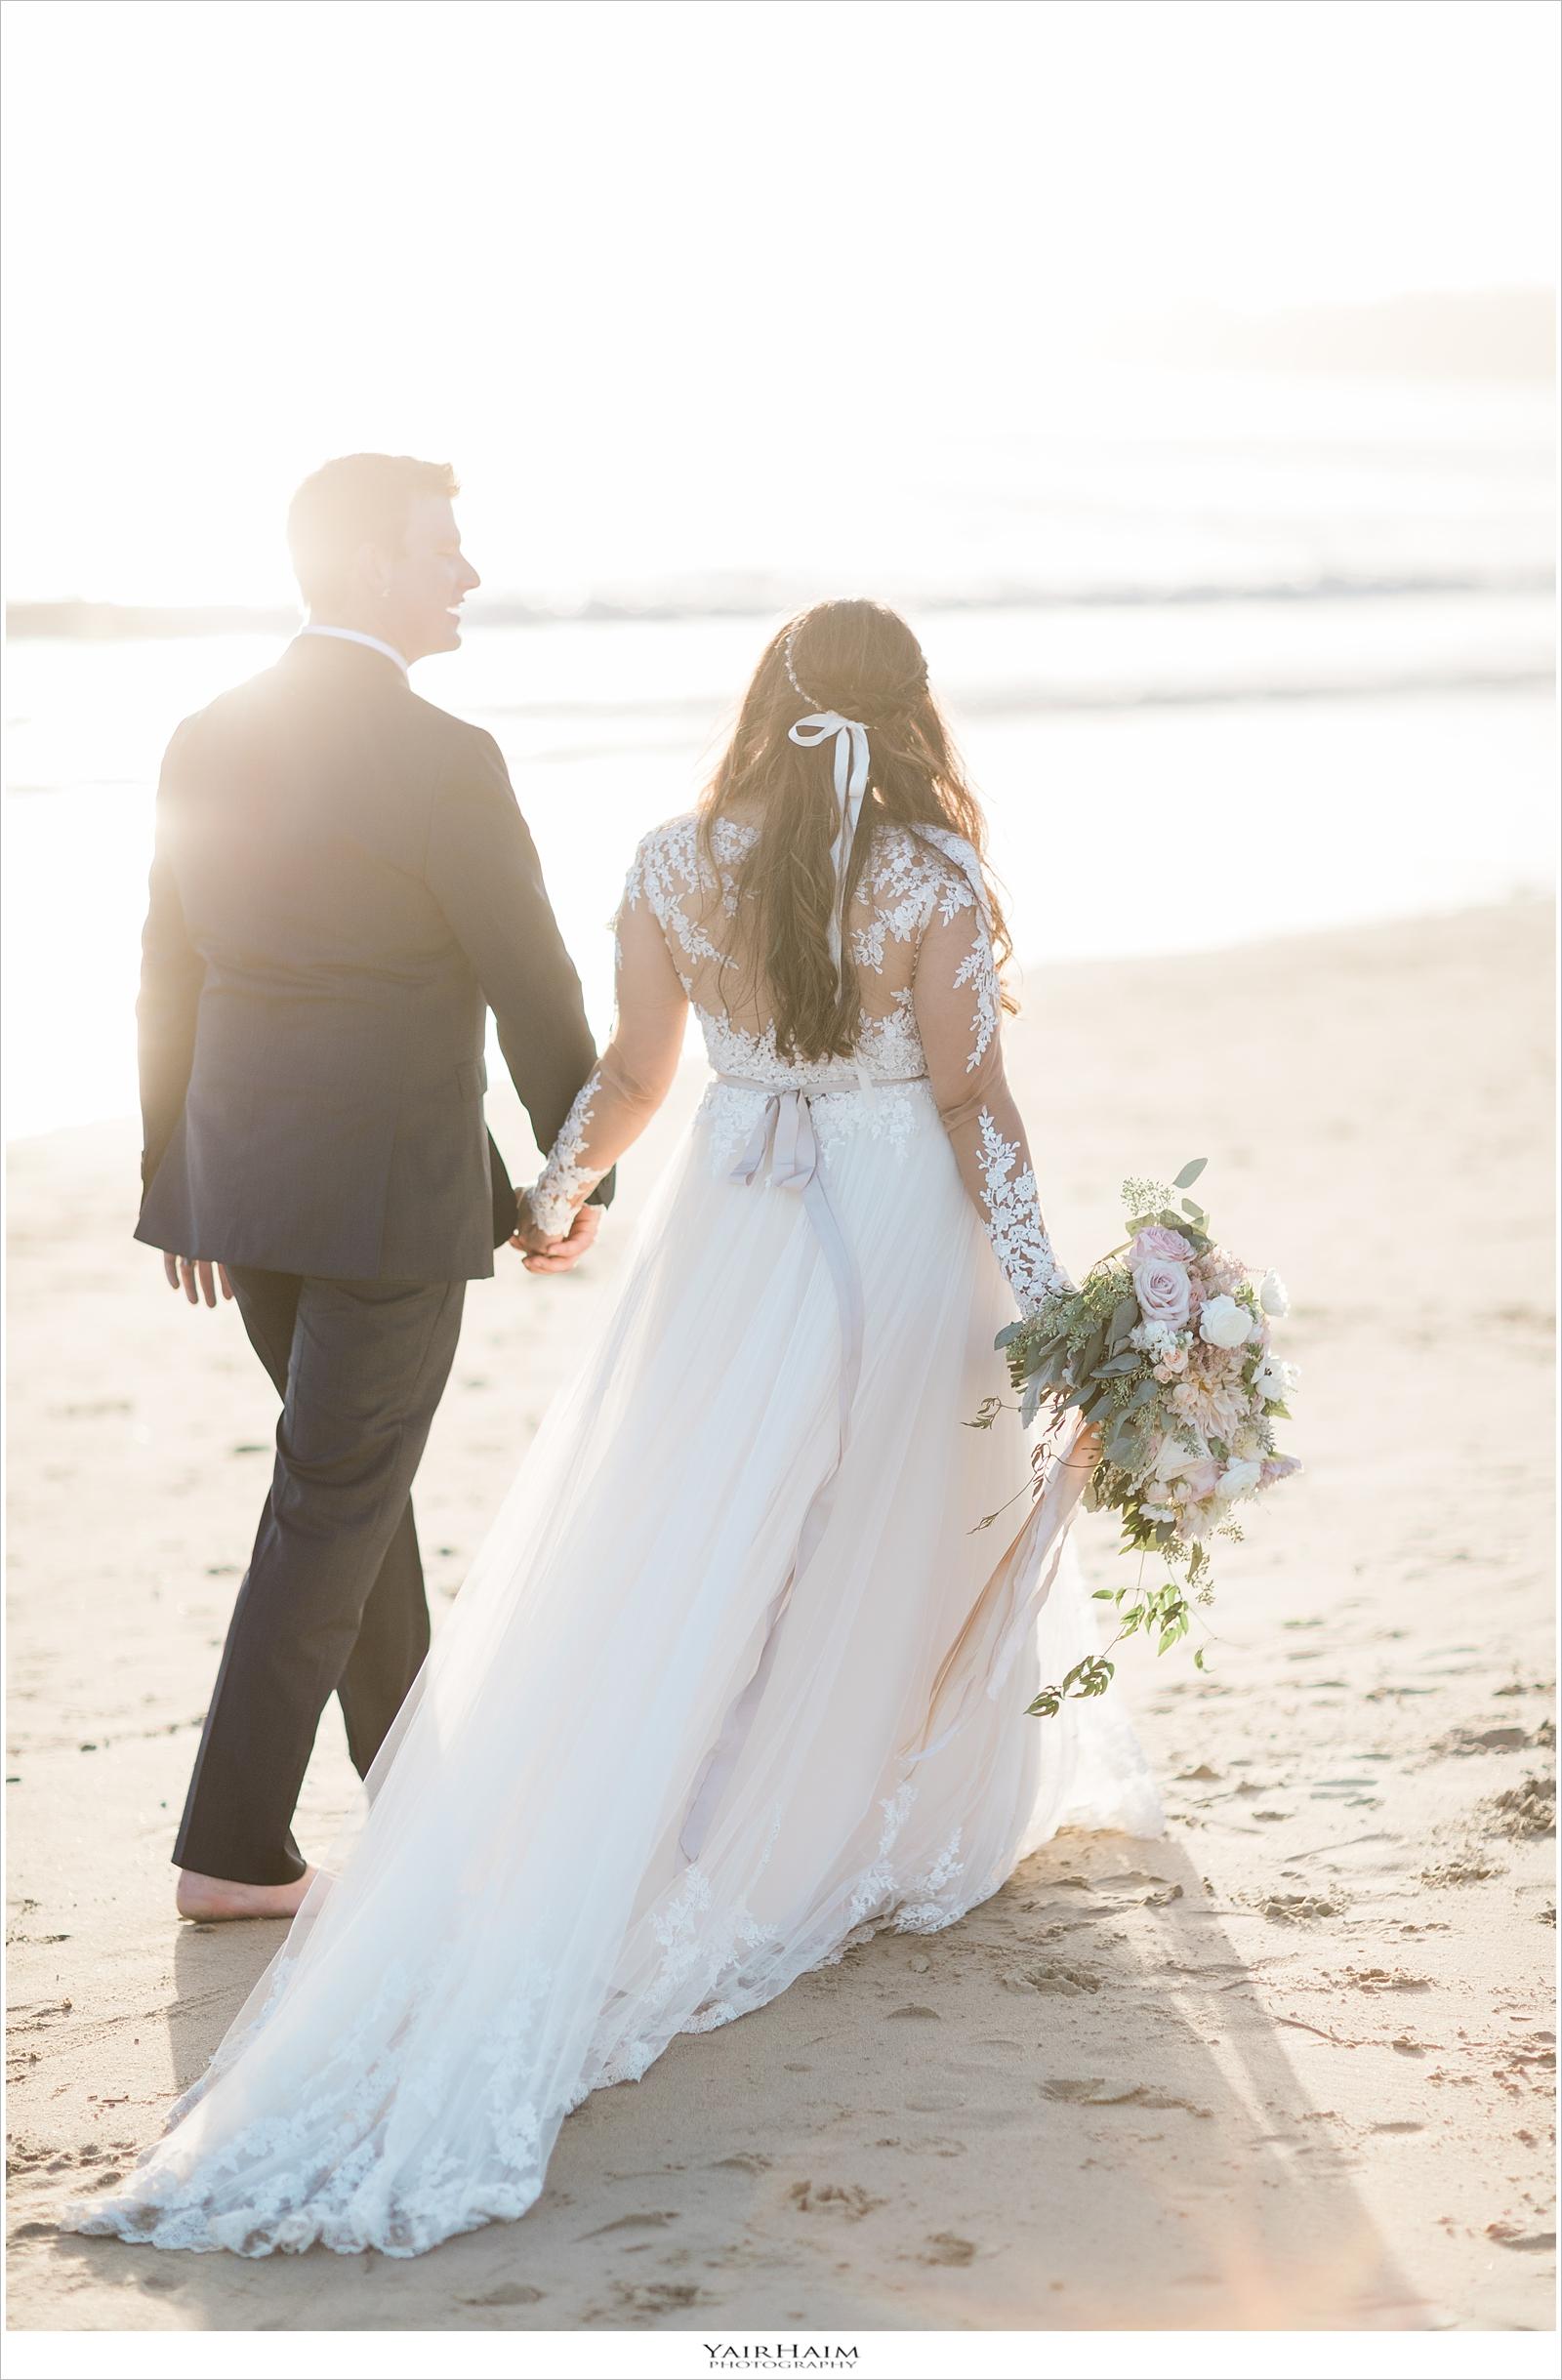 Chrystle-Robbie-wedding-photos-756.JPG